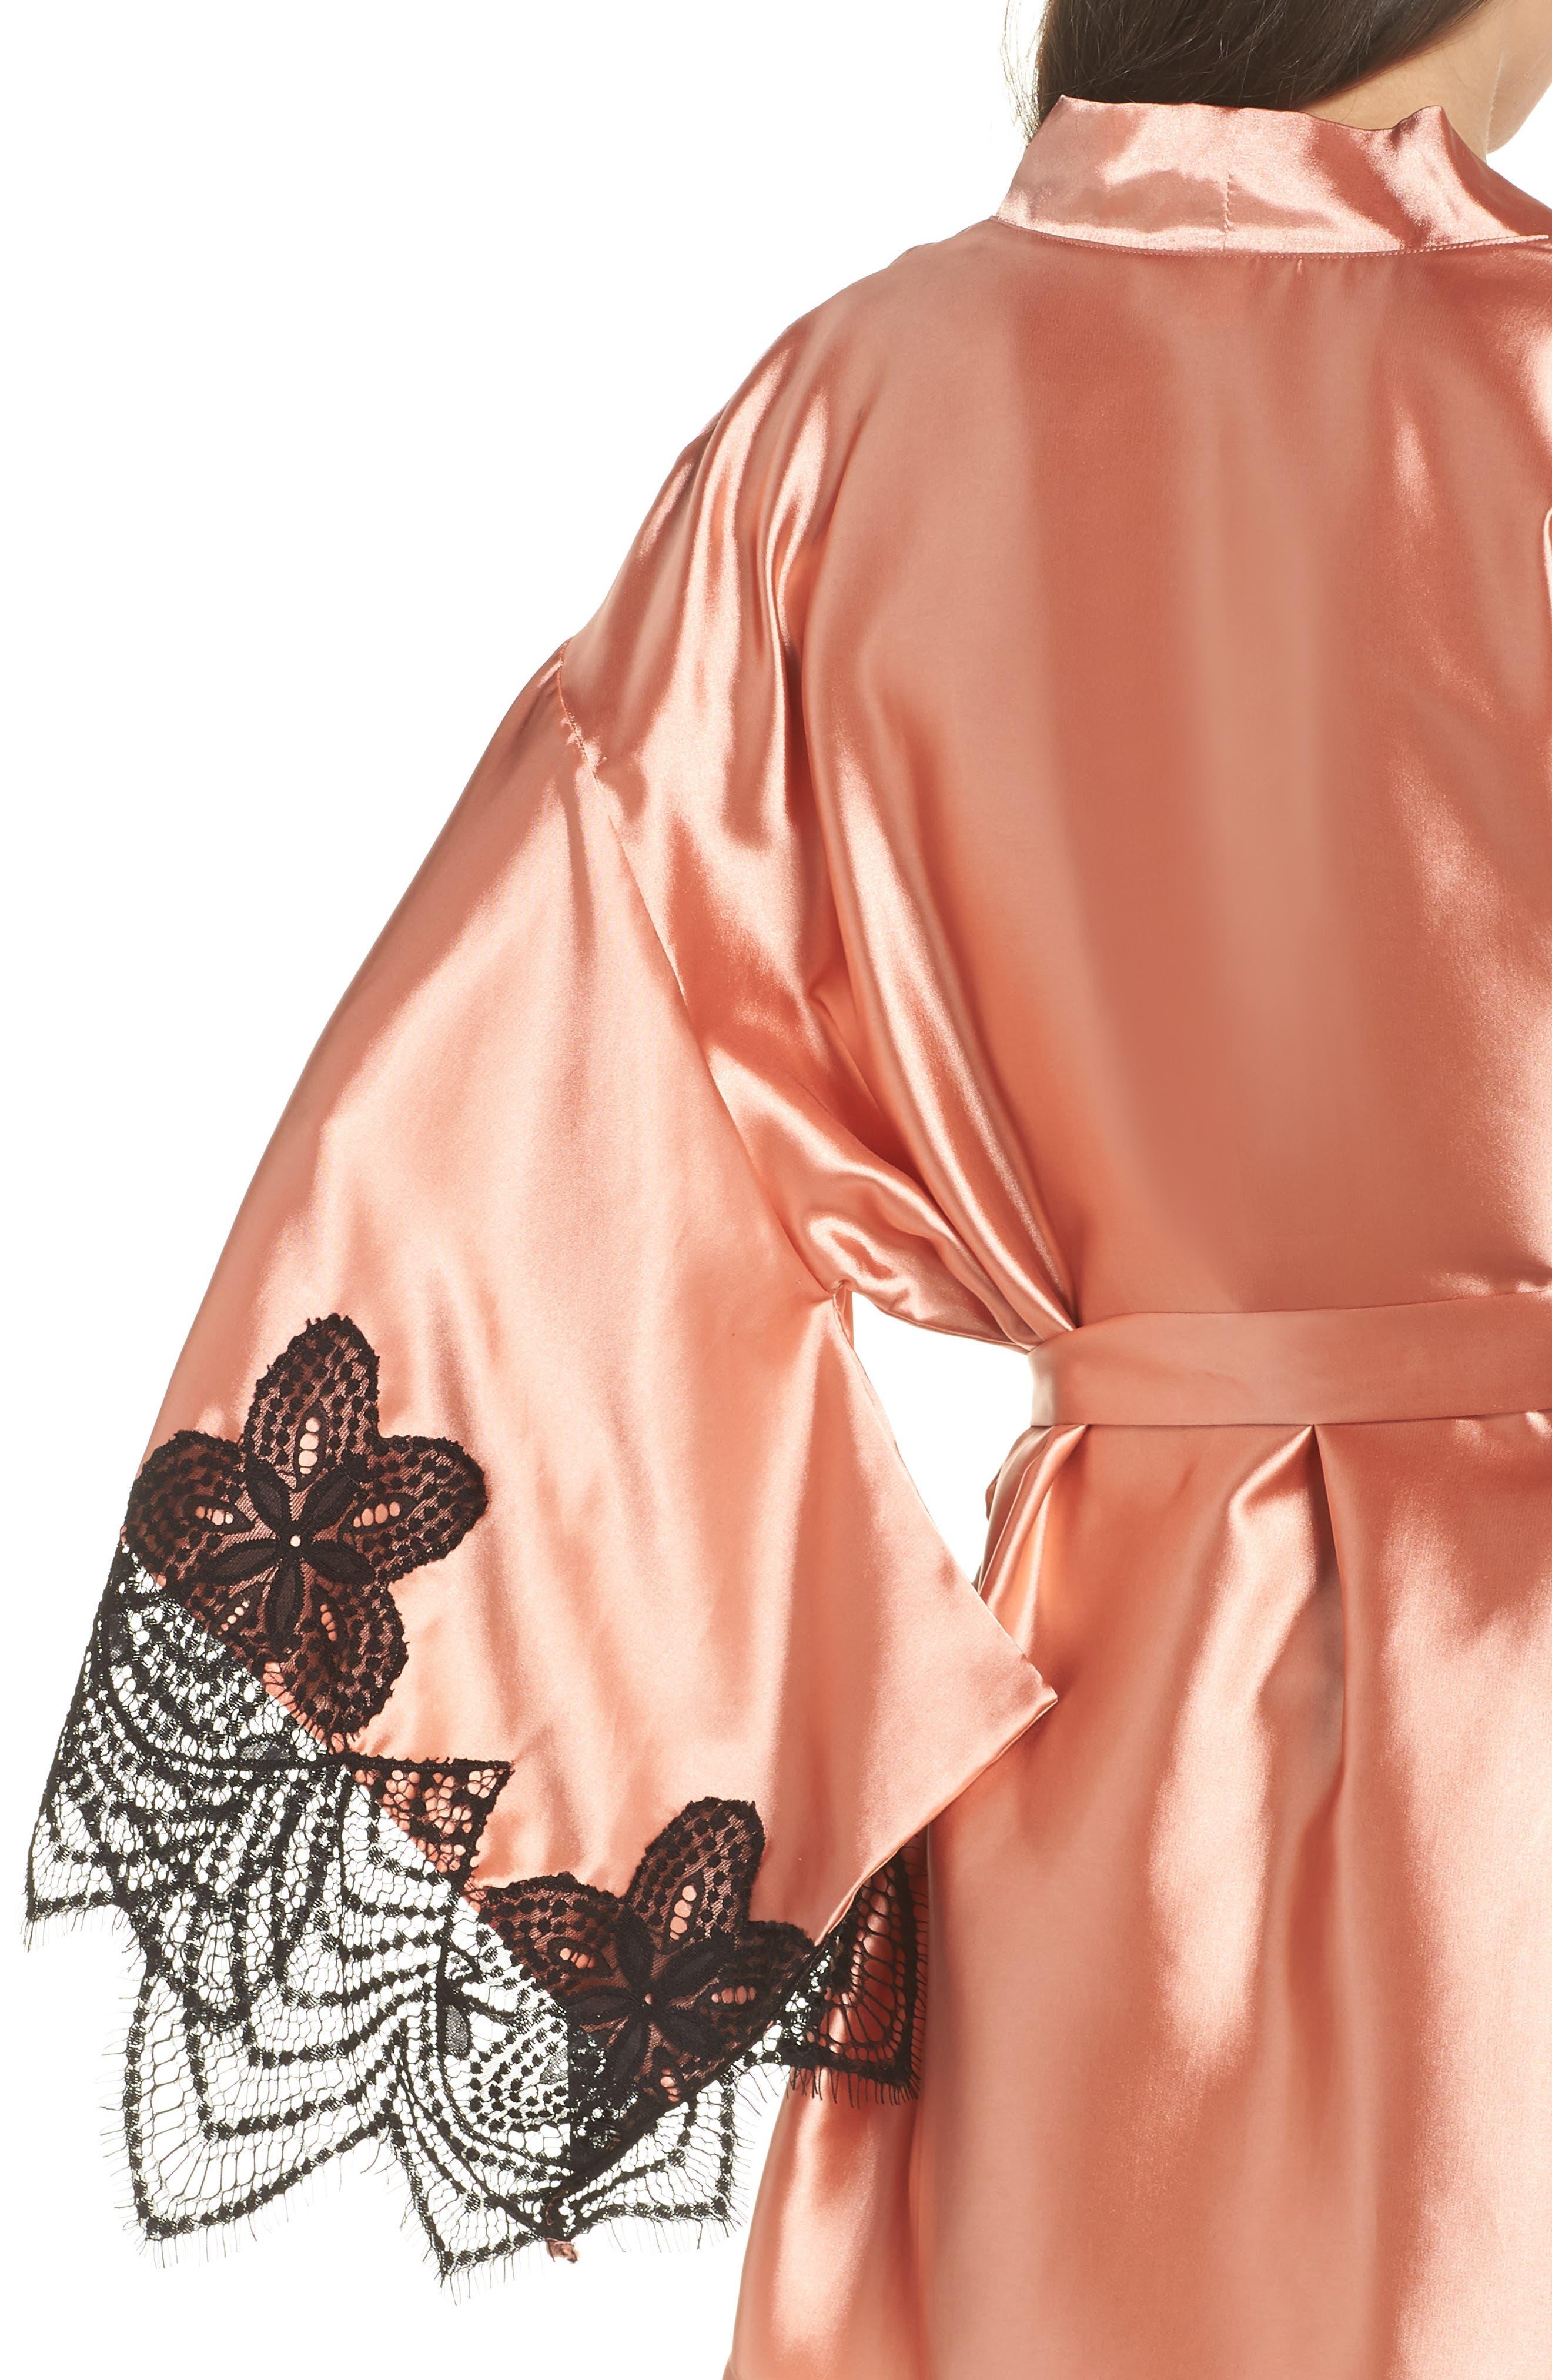 Drama Lace Trim Satin Robe,                             Alternate thumbnail 4, color,                             CAMEO BROWN/ BLACK